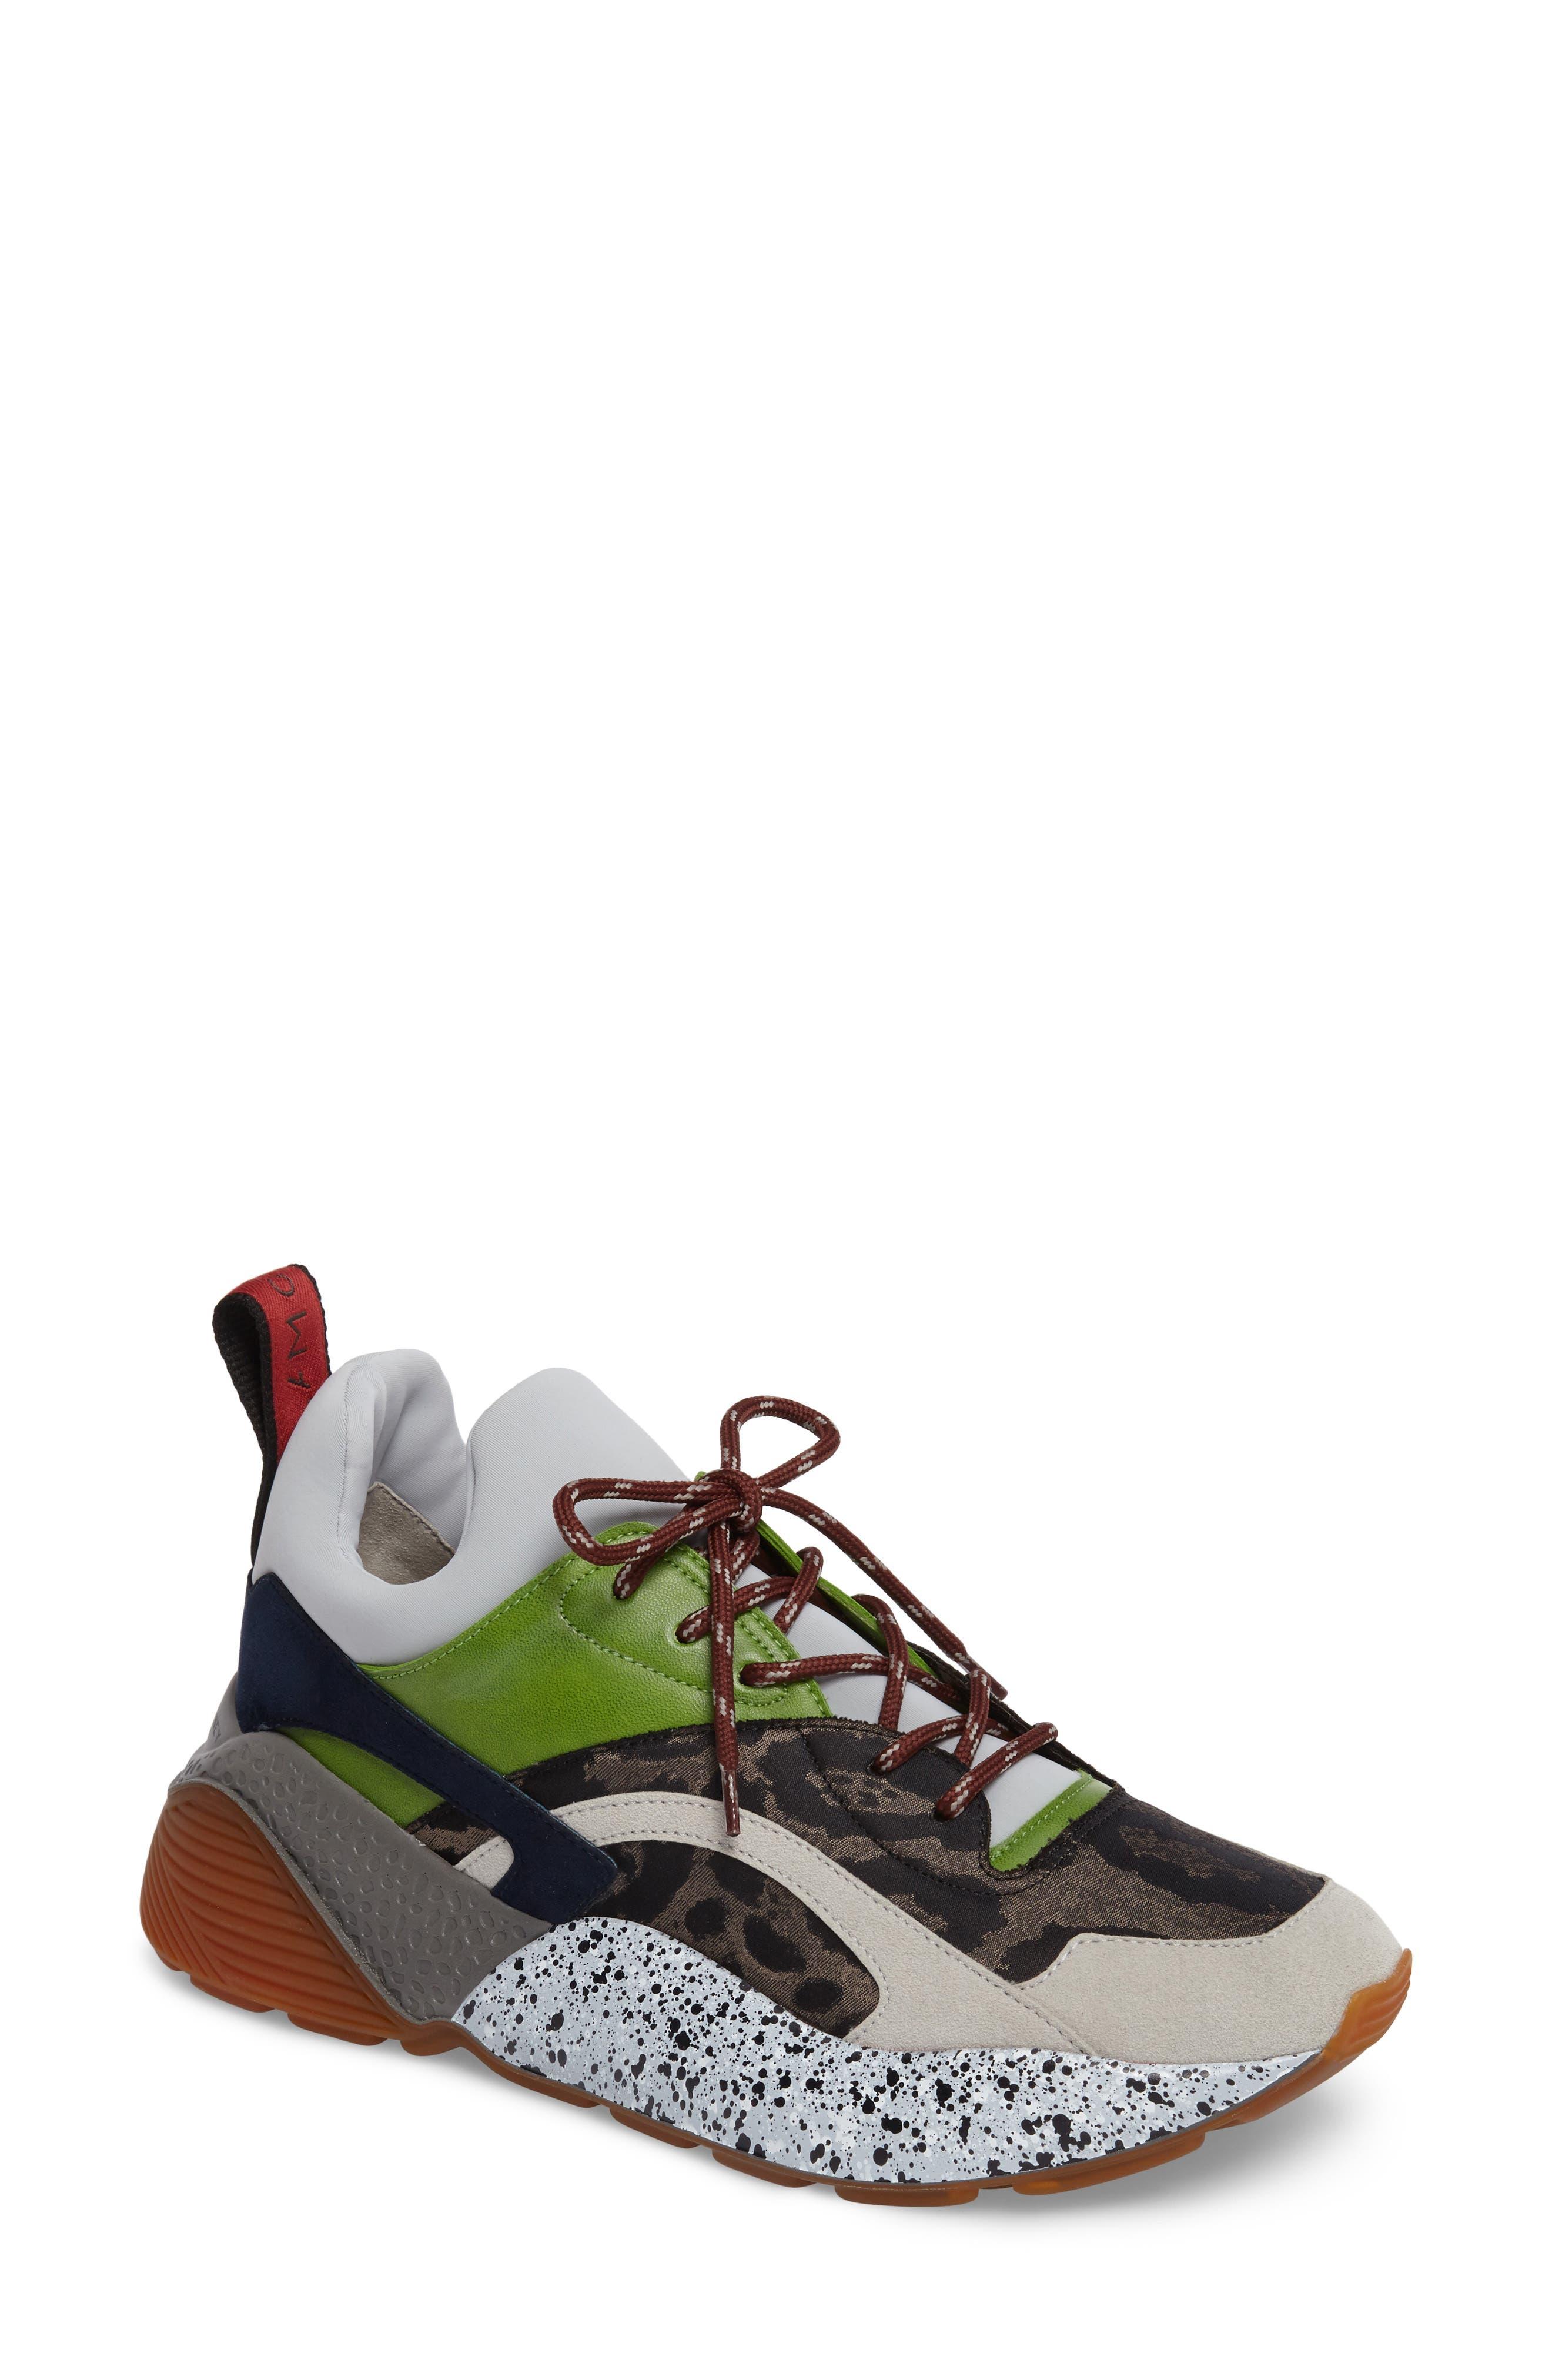 Eclypse Sneaker,                         Main,                         color, Grey Multi